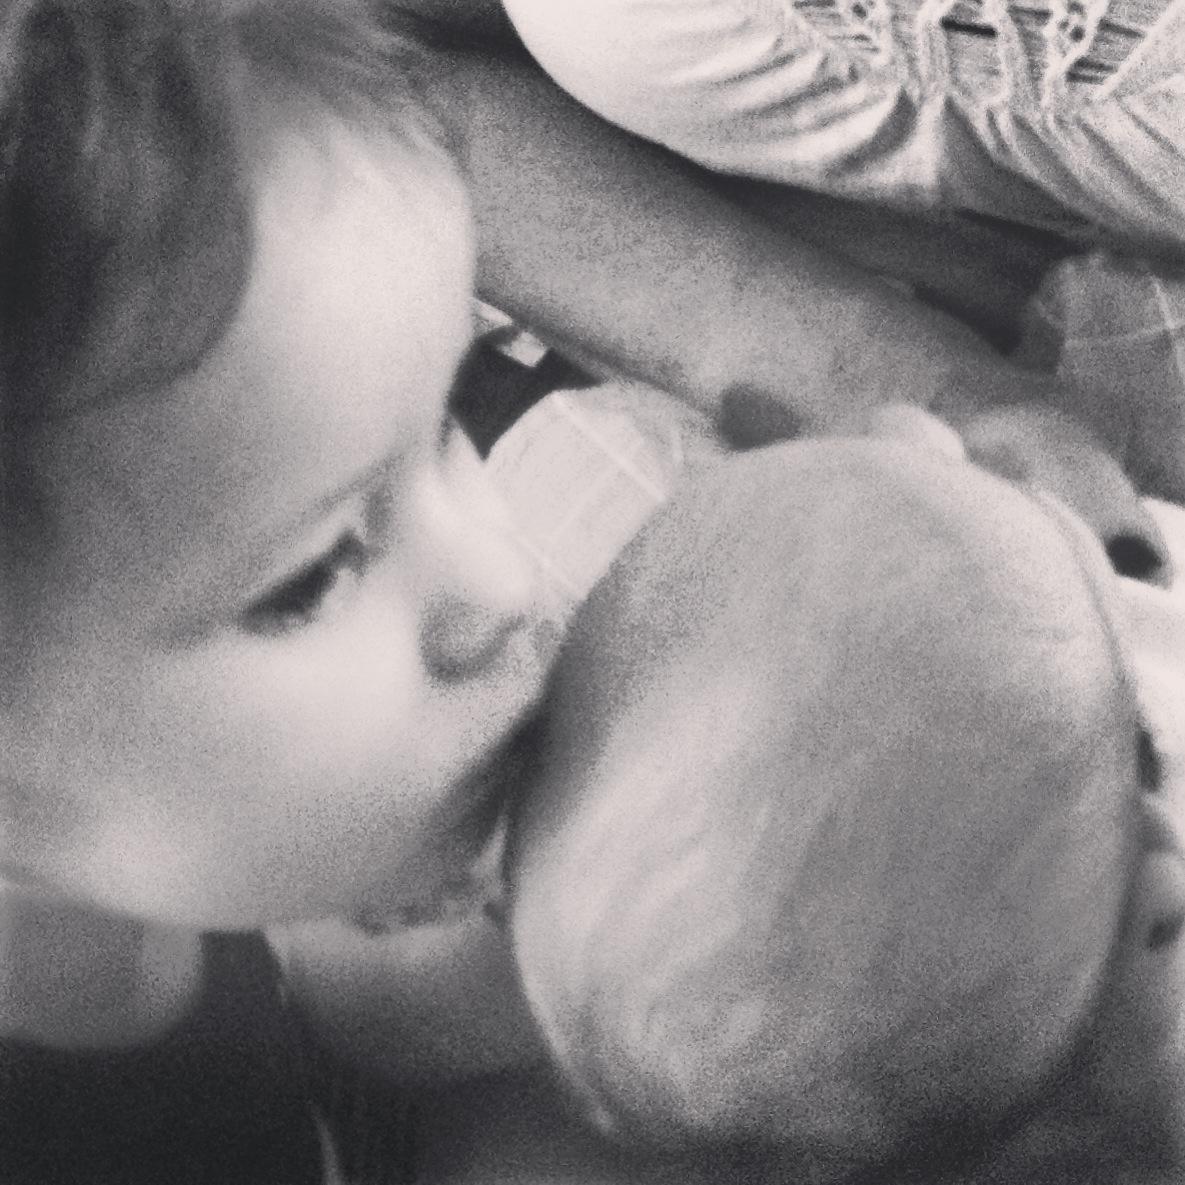 Hudson soft head kiss for Emilie